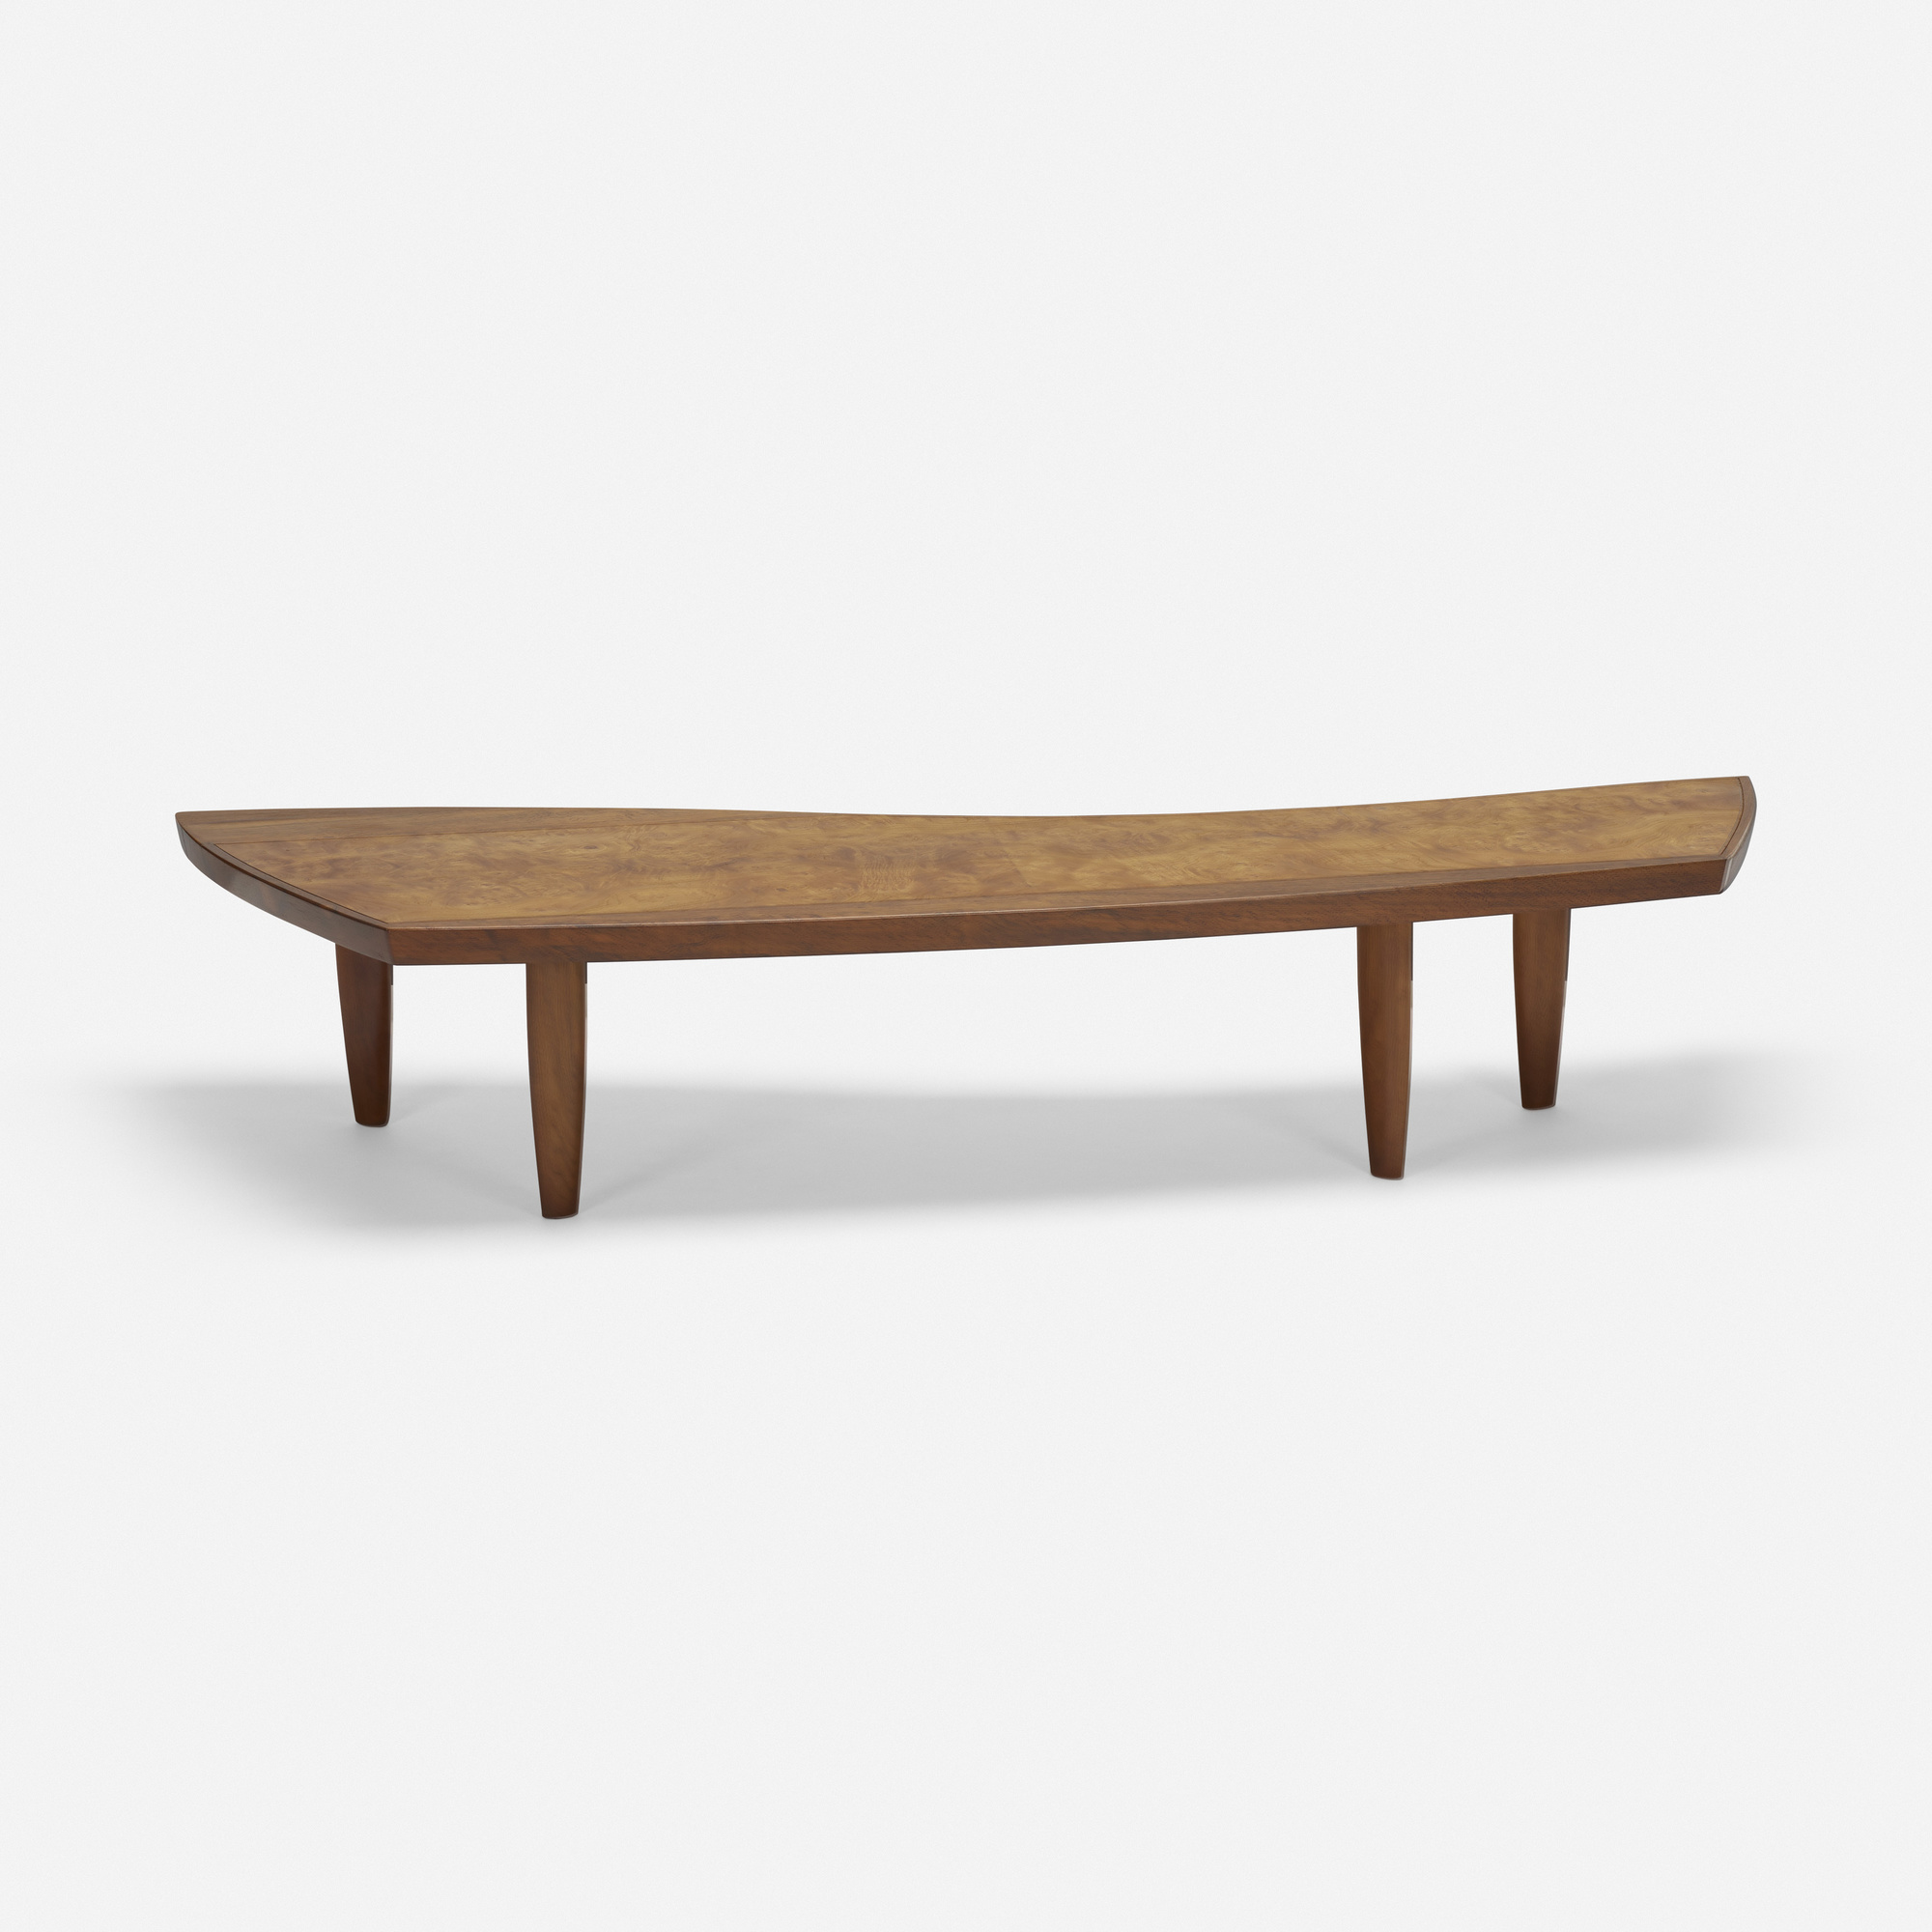 122 george nakashima coffee table model 200 66w design 23